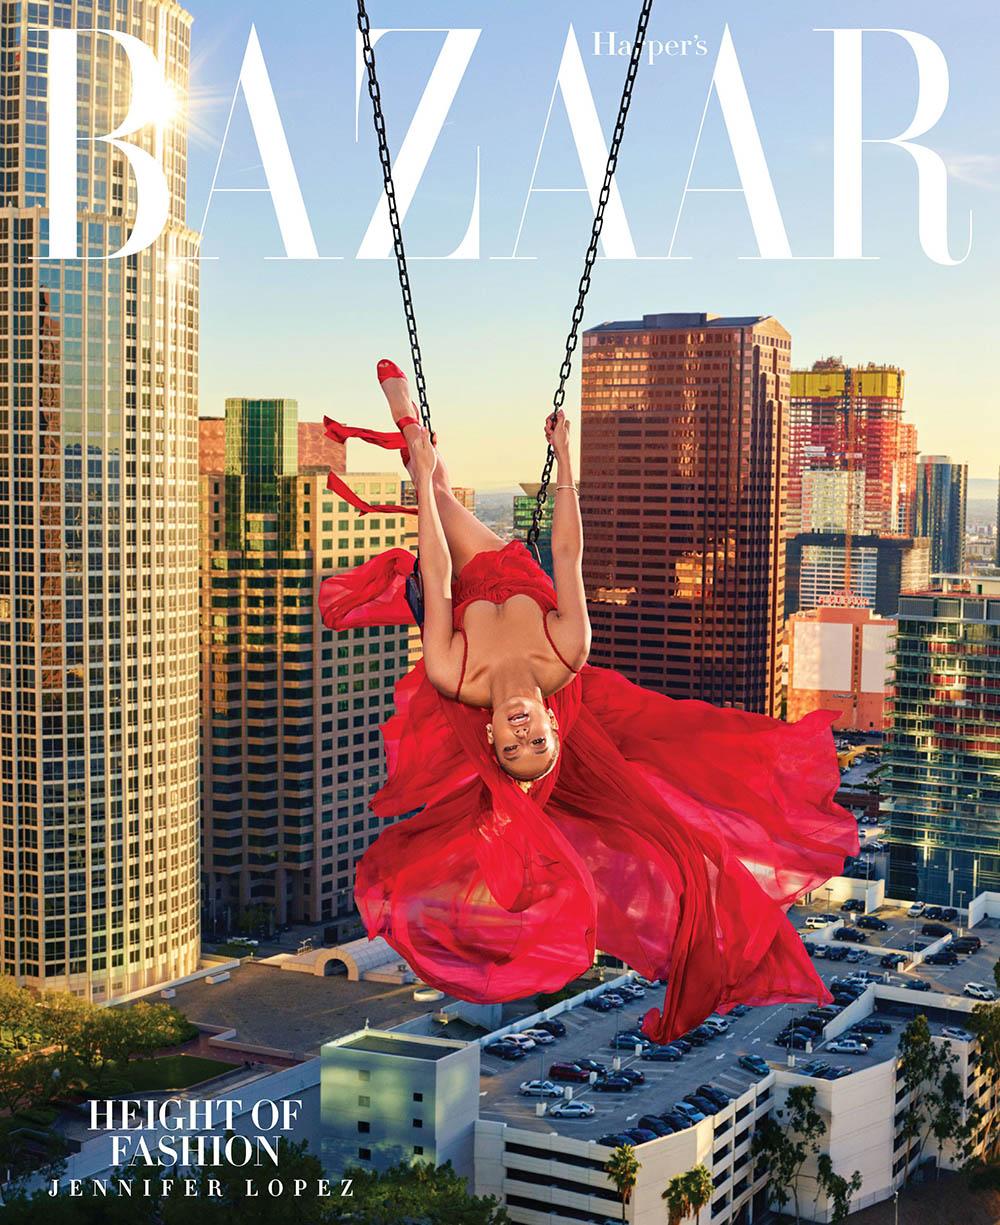 Jennifer Lopez covers Harper's Bazaar US April 2018 by Mariano Vivanco